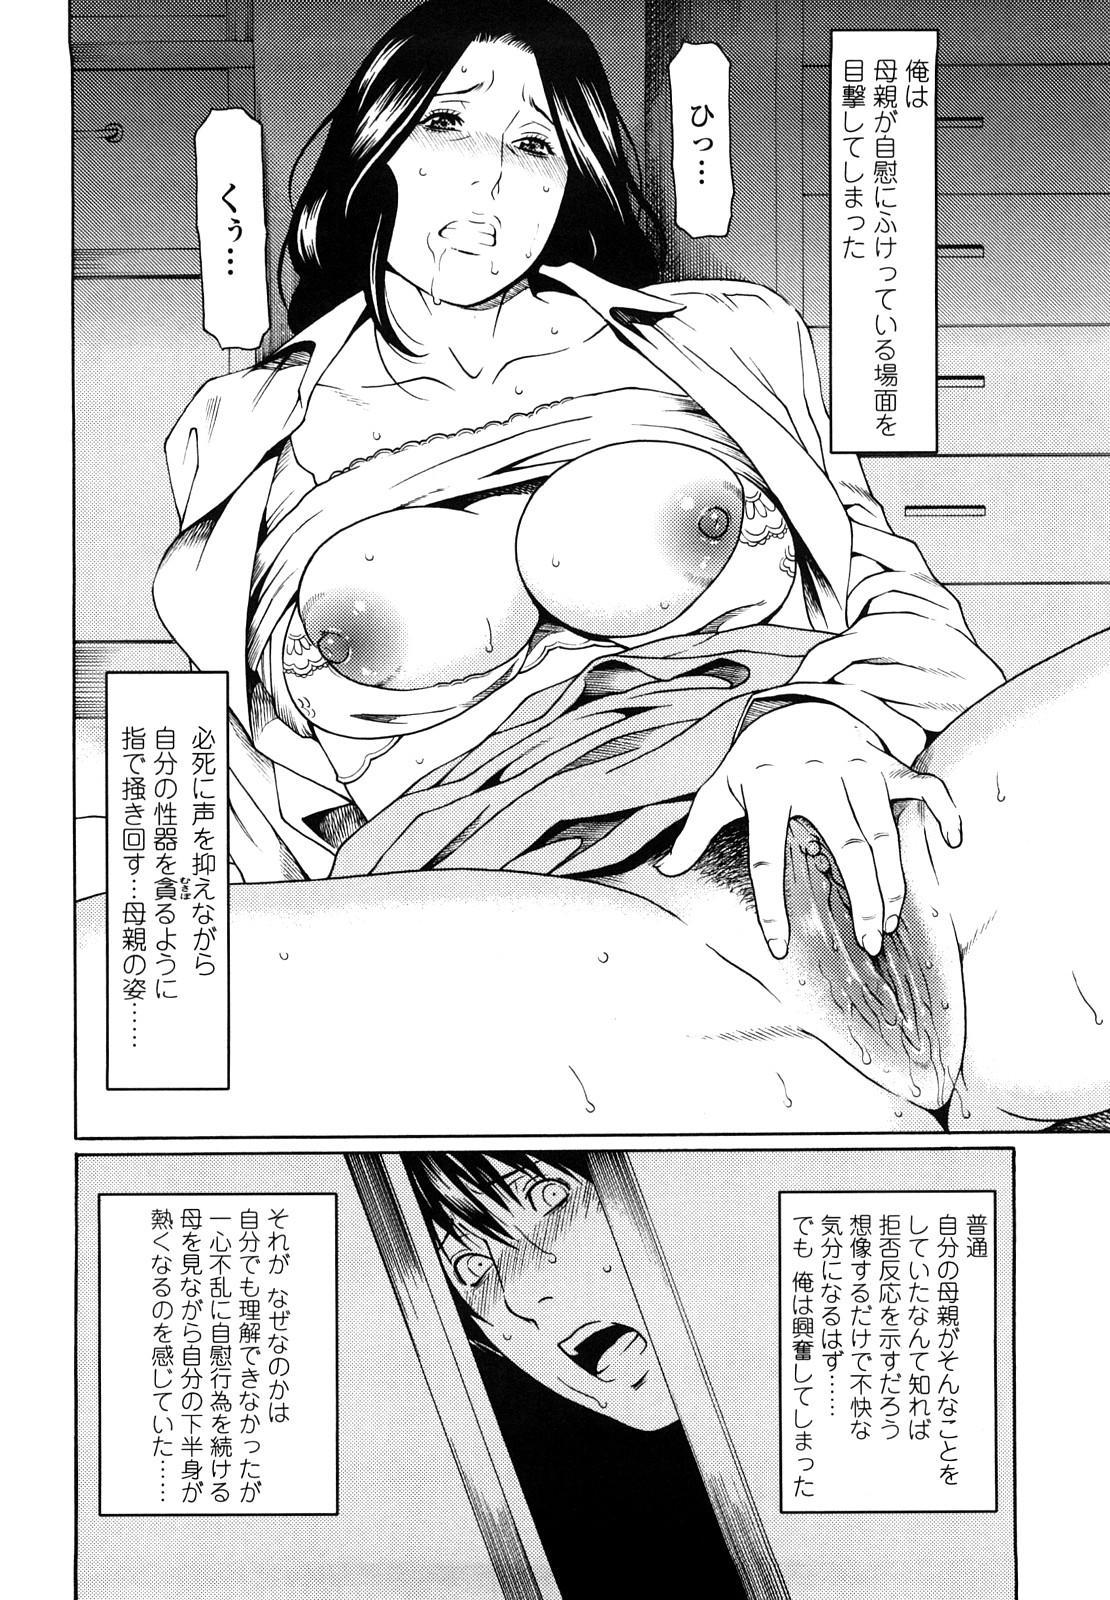 [Takasugi Kou] Kindan no Haha-Ana - Immorality Love-Hole [Decensored] 23